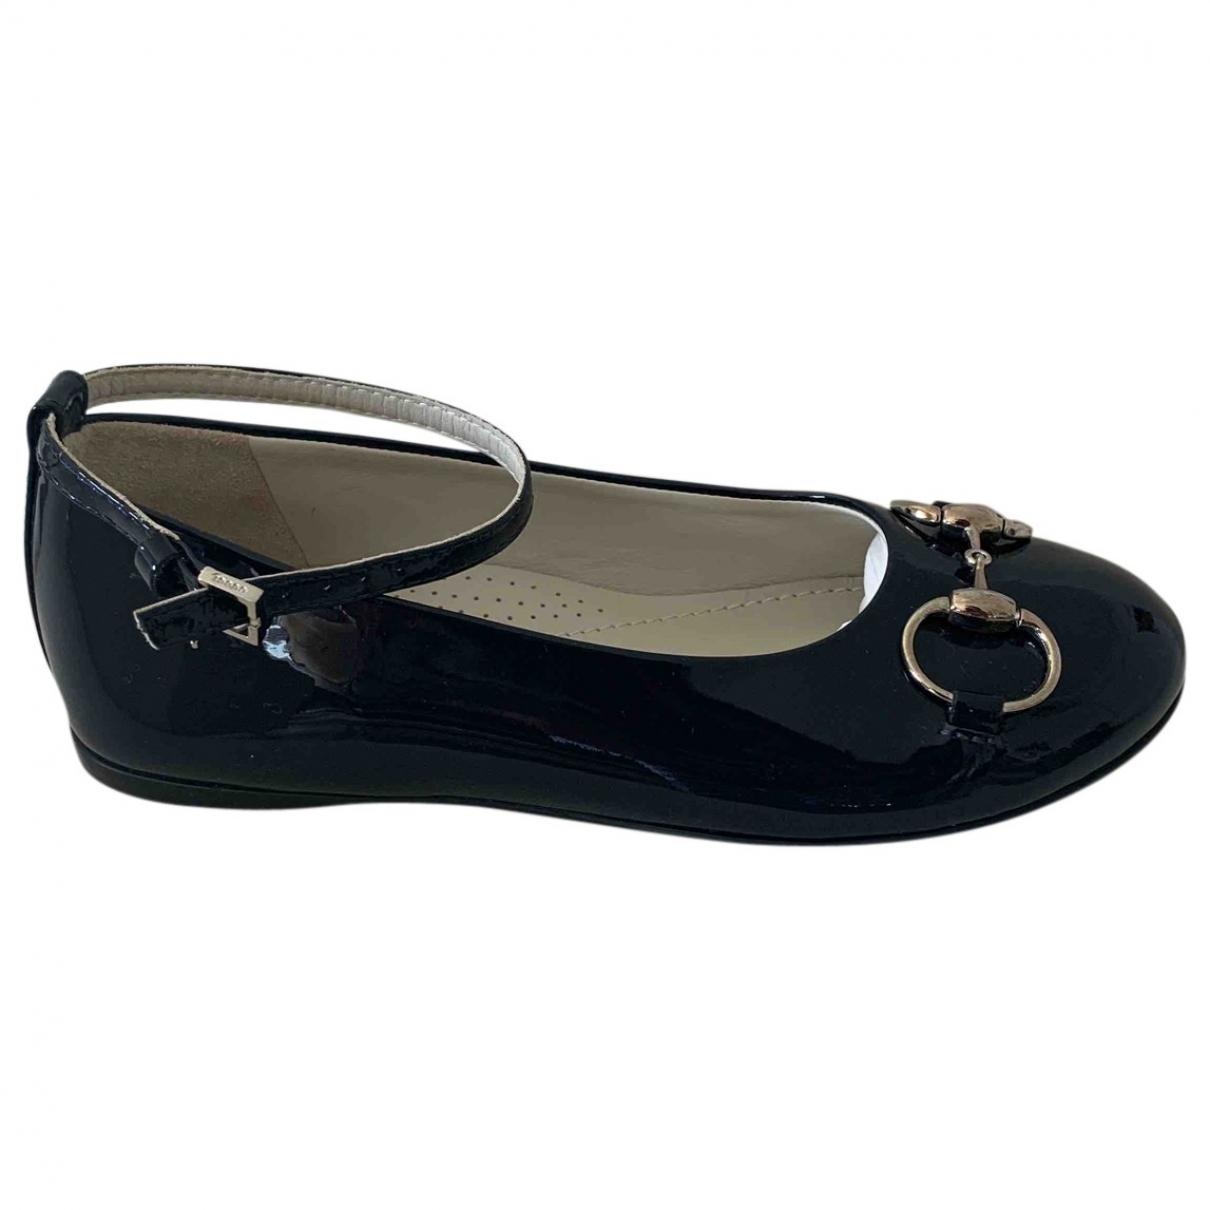 Gucci \N Black Patent leather Ballet flats for Kids 30 EU